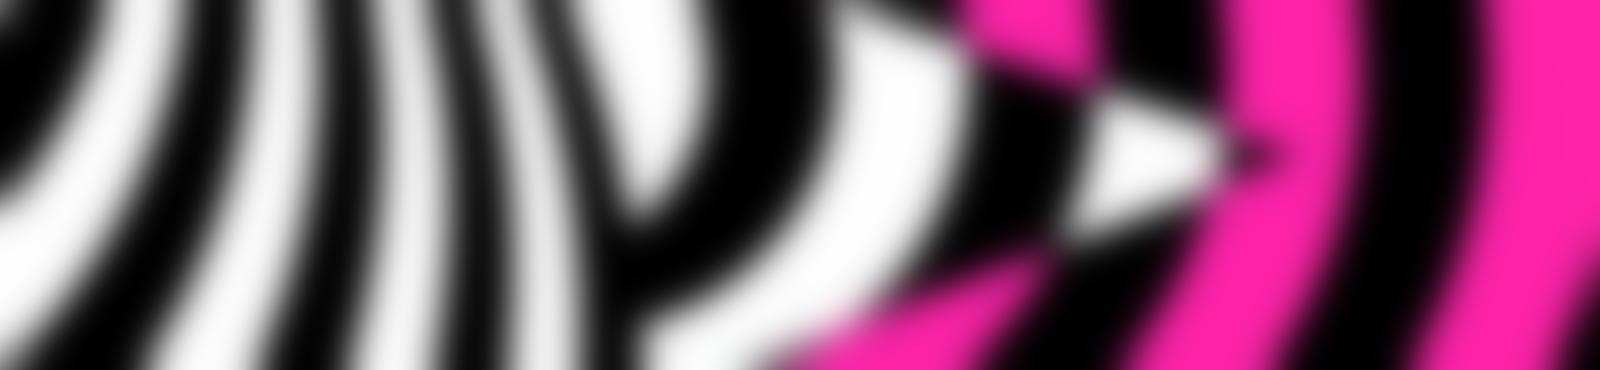 Blurred a8e919f2 b344 4cba adae 3cad56f94cff